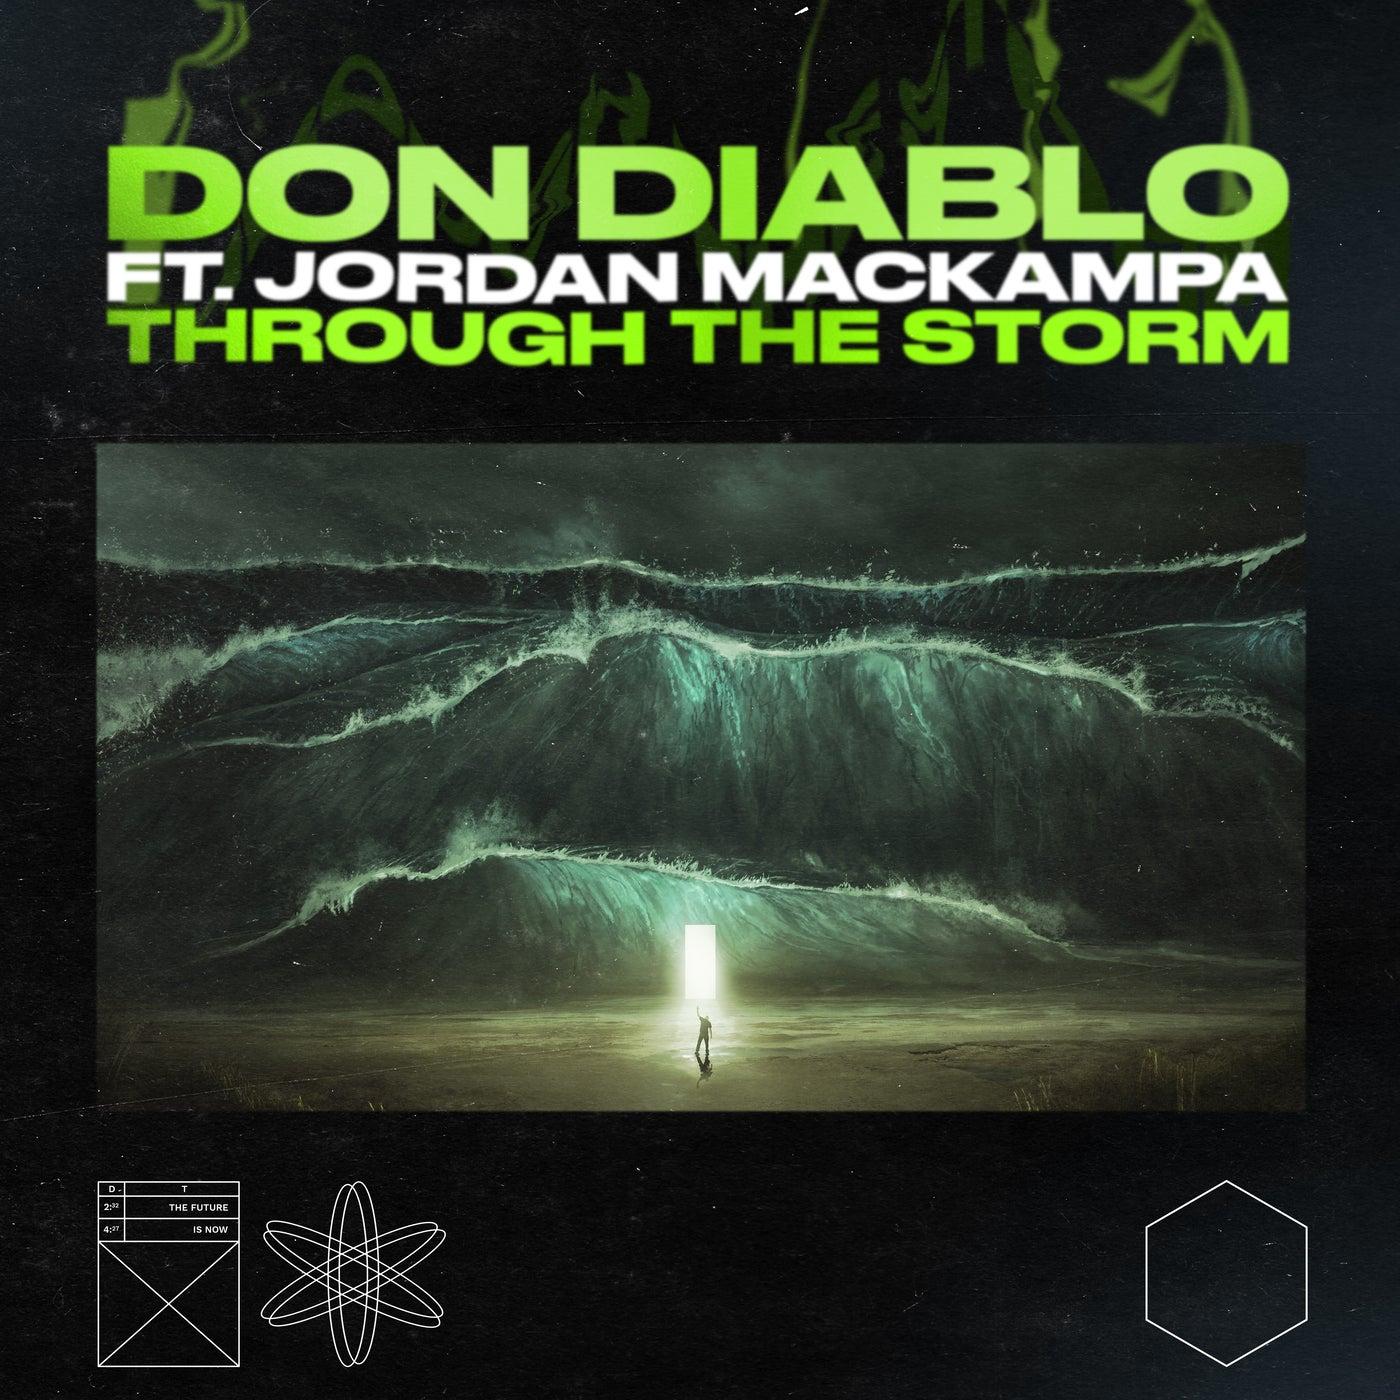 Through The Storm feat. Jordan Mackampa (Extended Mix)